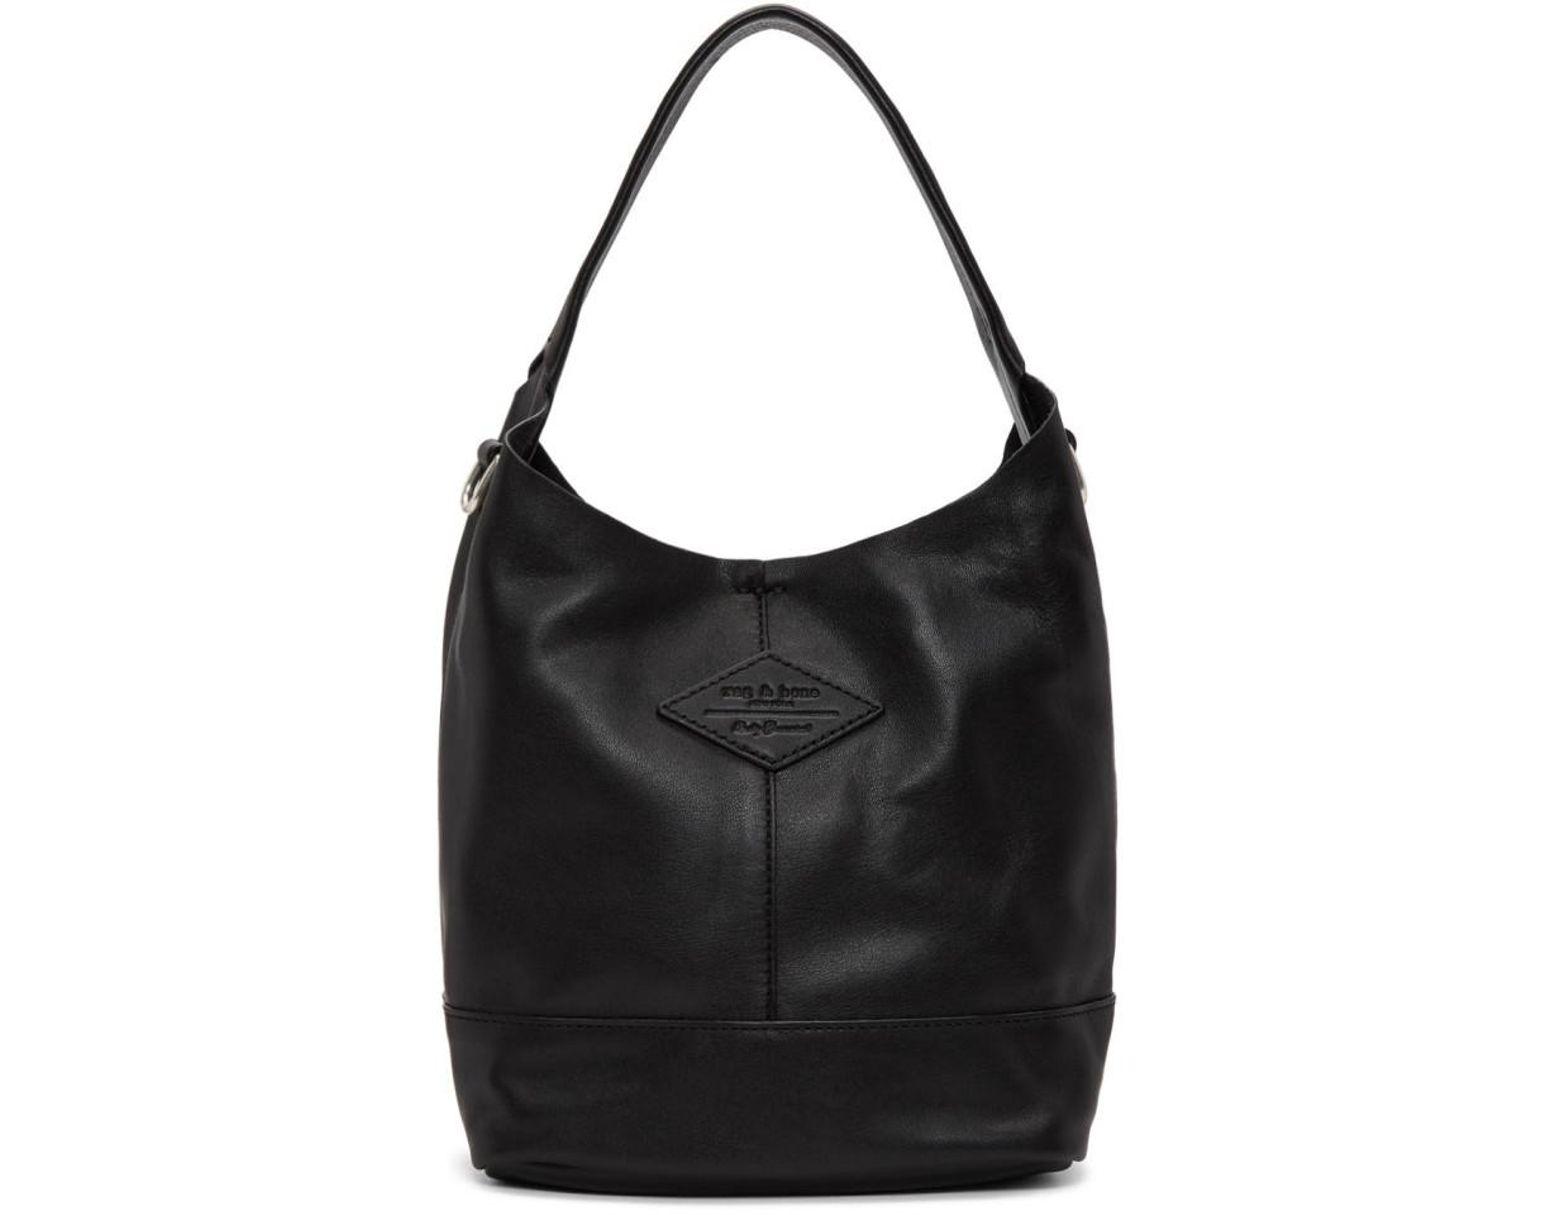 Shopper Sac Mini En Lyst Noir Coloris Ragamp; Camden Bone F3TlJK1c